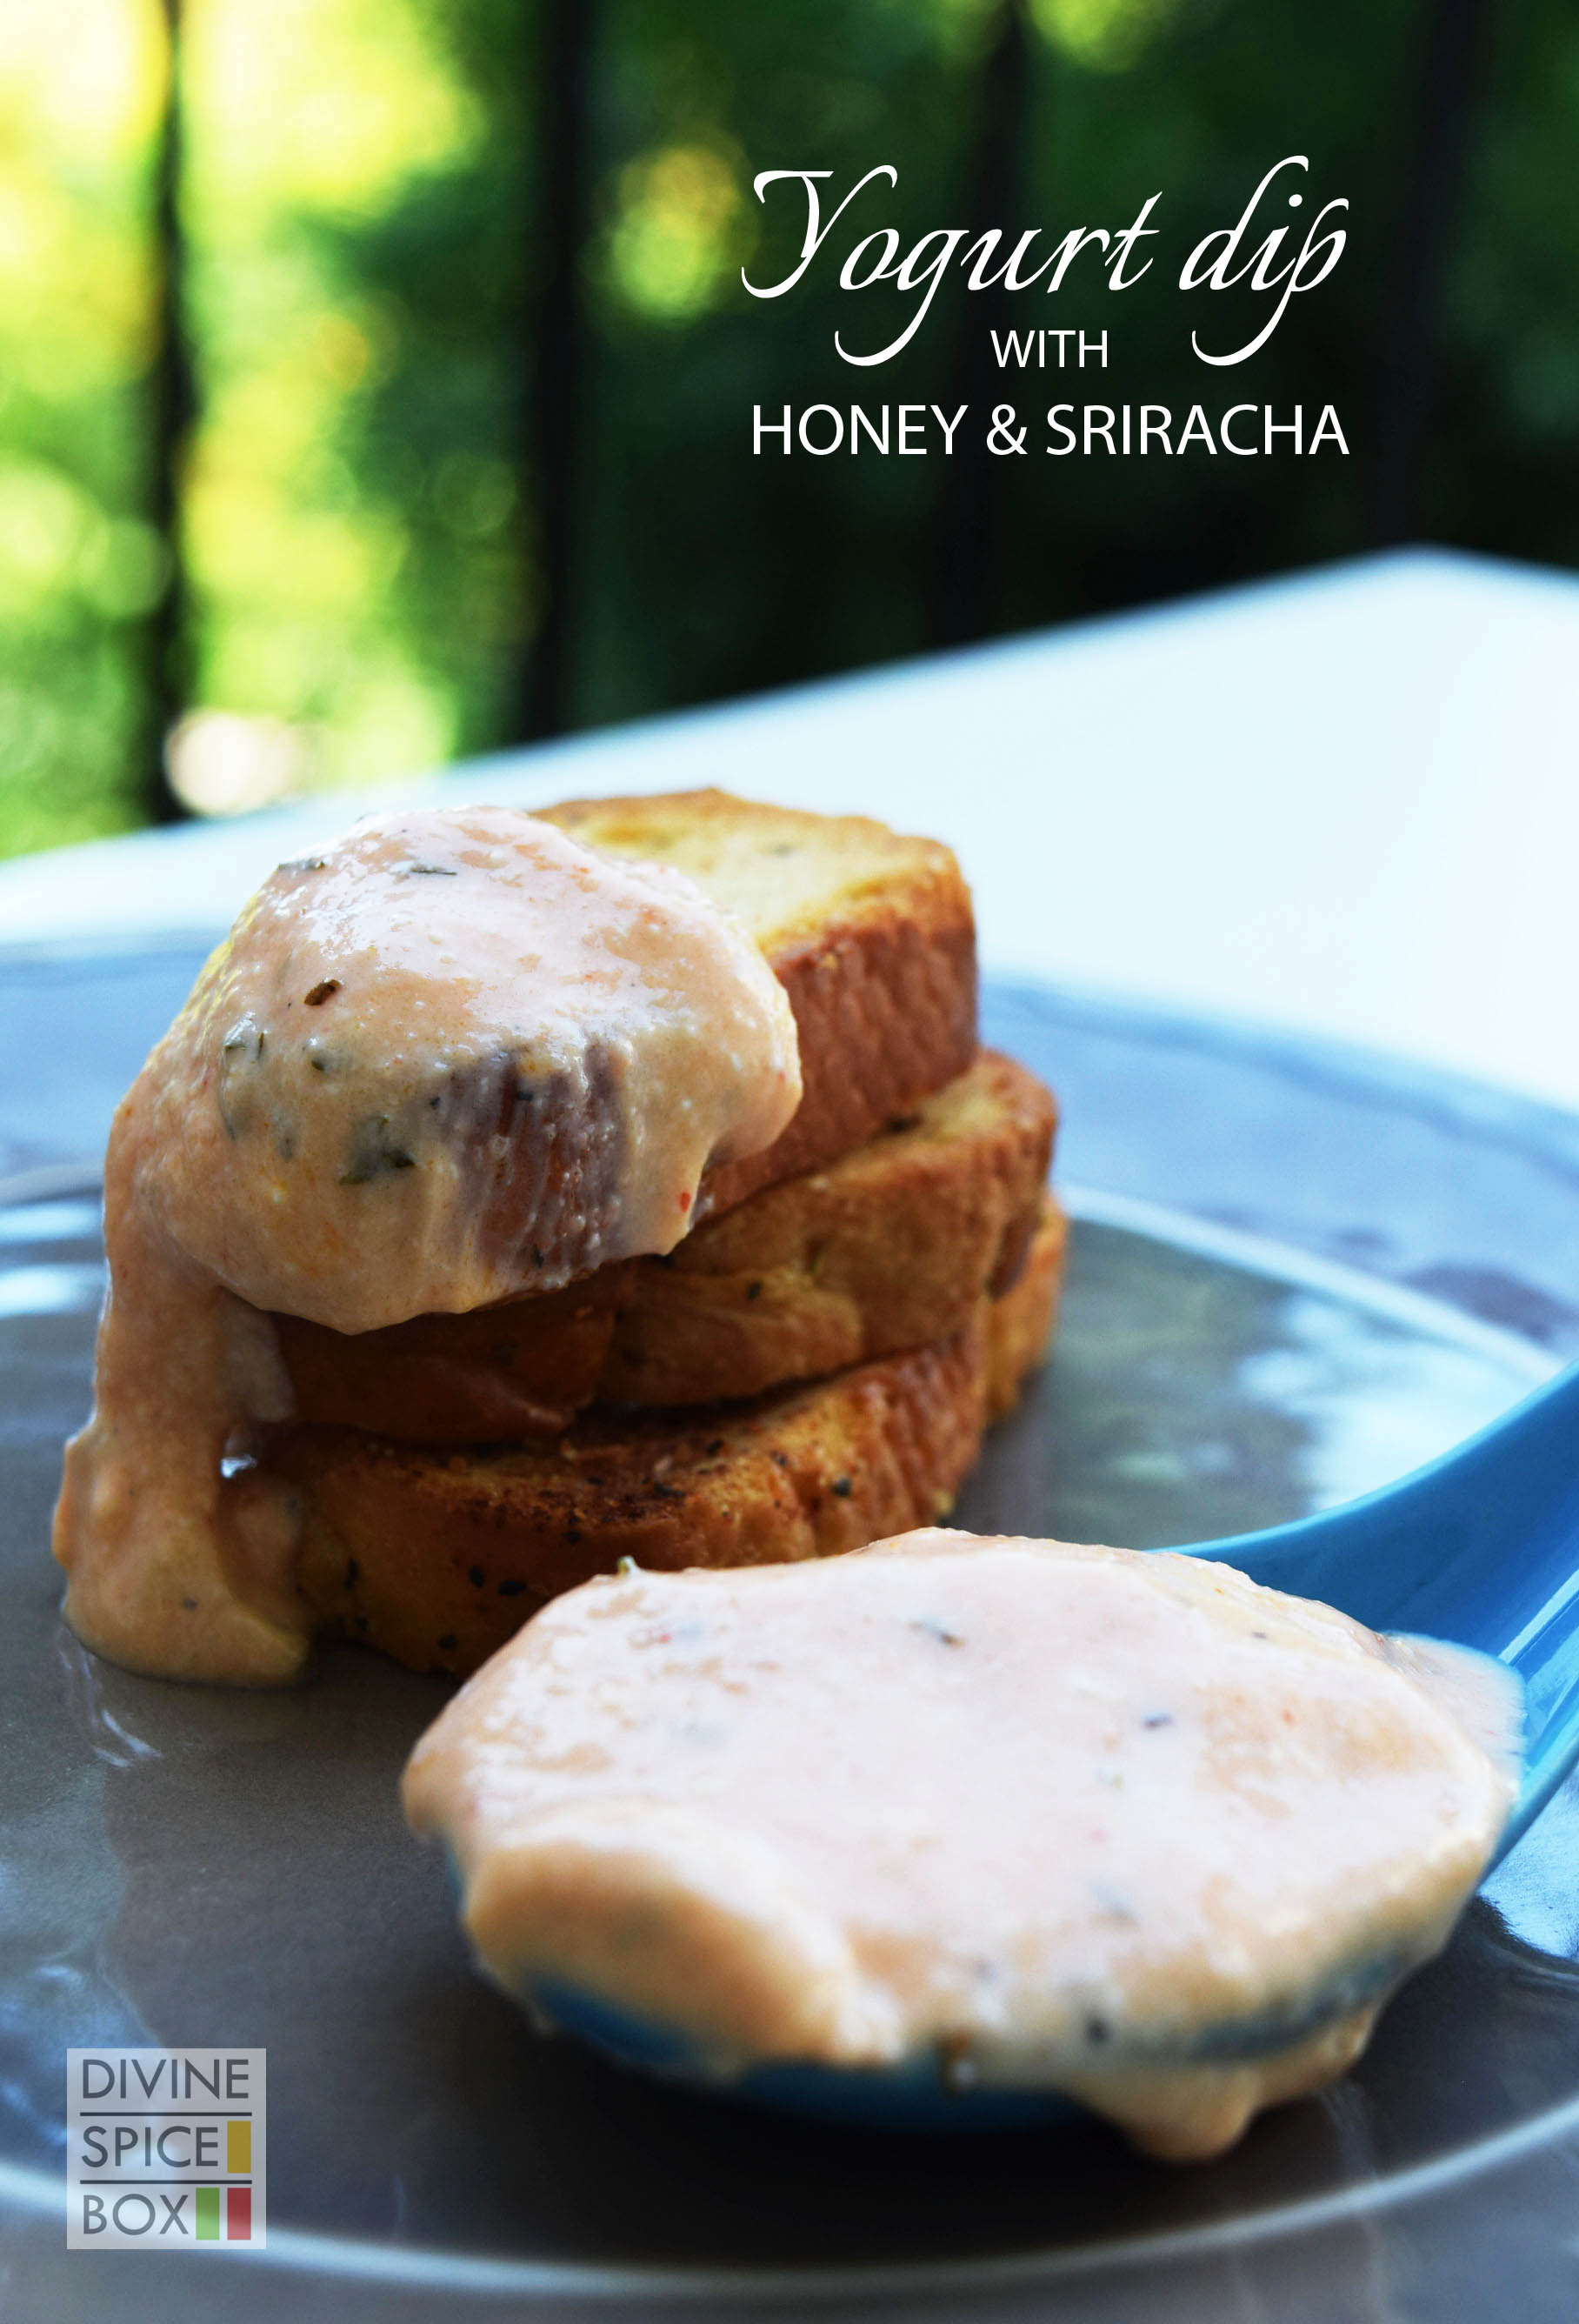 yogurt dip with honey and sriracha copy